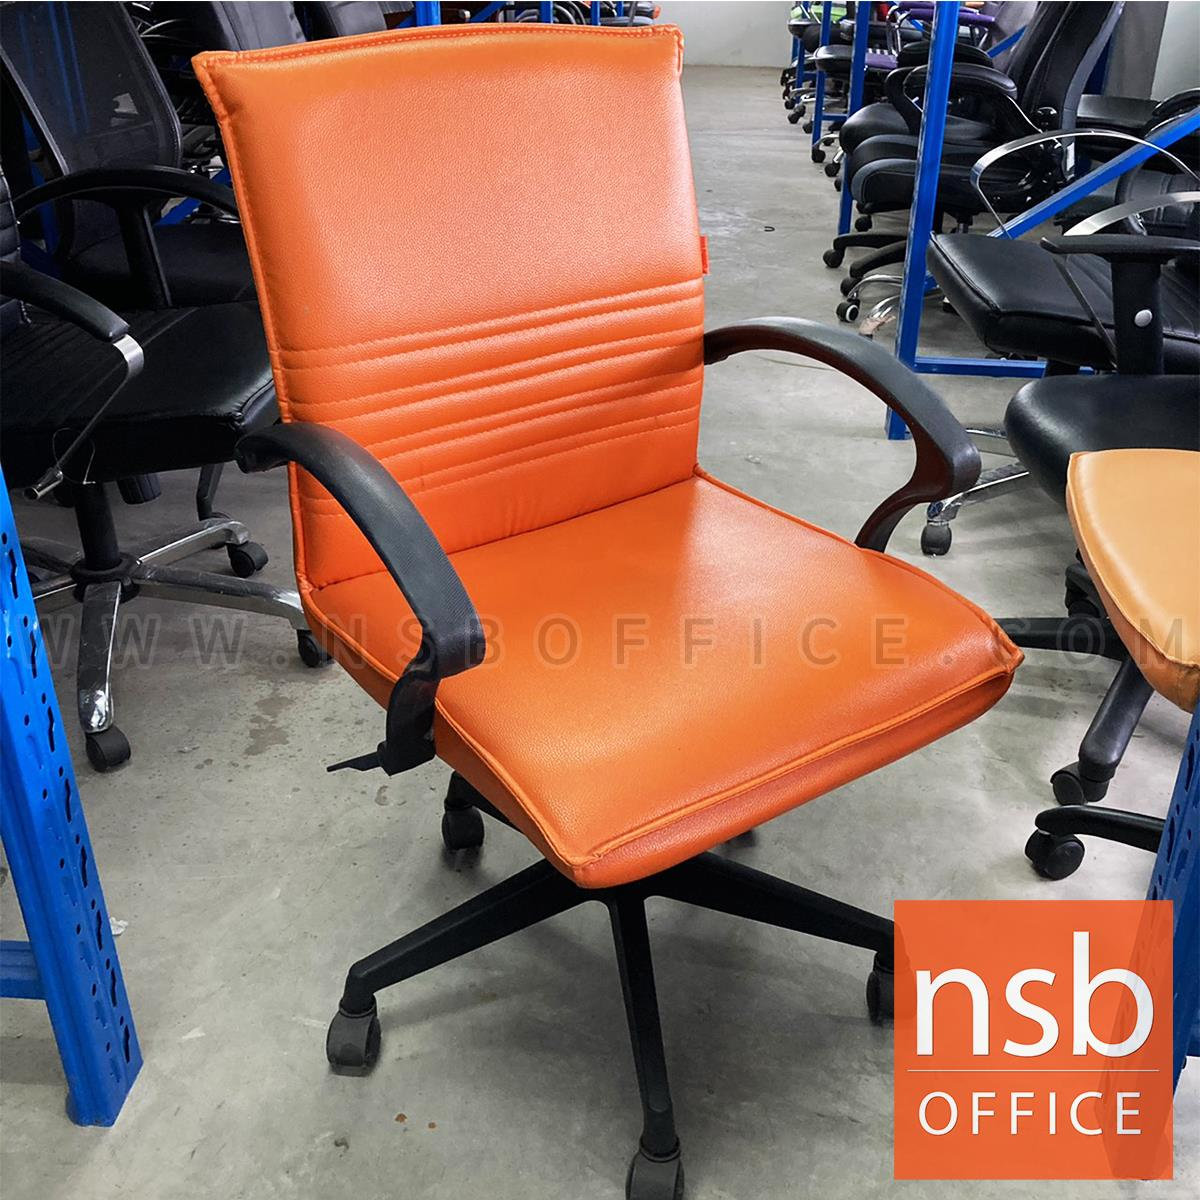 L02A365:เก้าอี้สำนักงาน   โช๊คแก๊ส มีก้อนโยก ขาพลาสติก